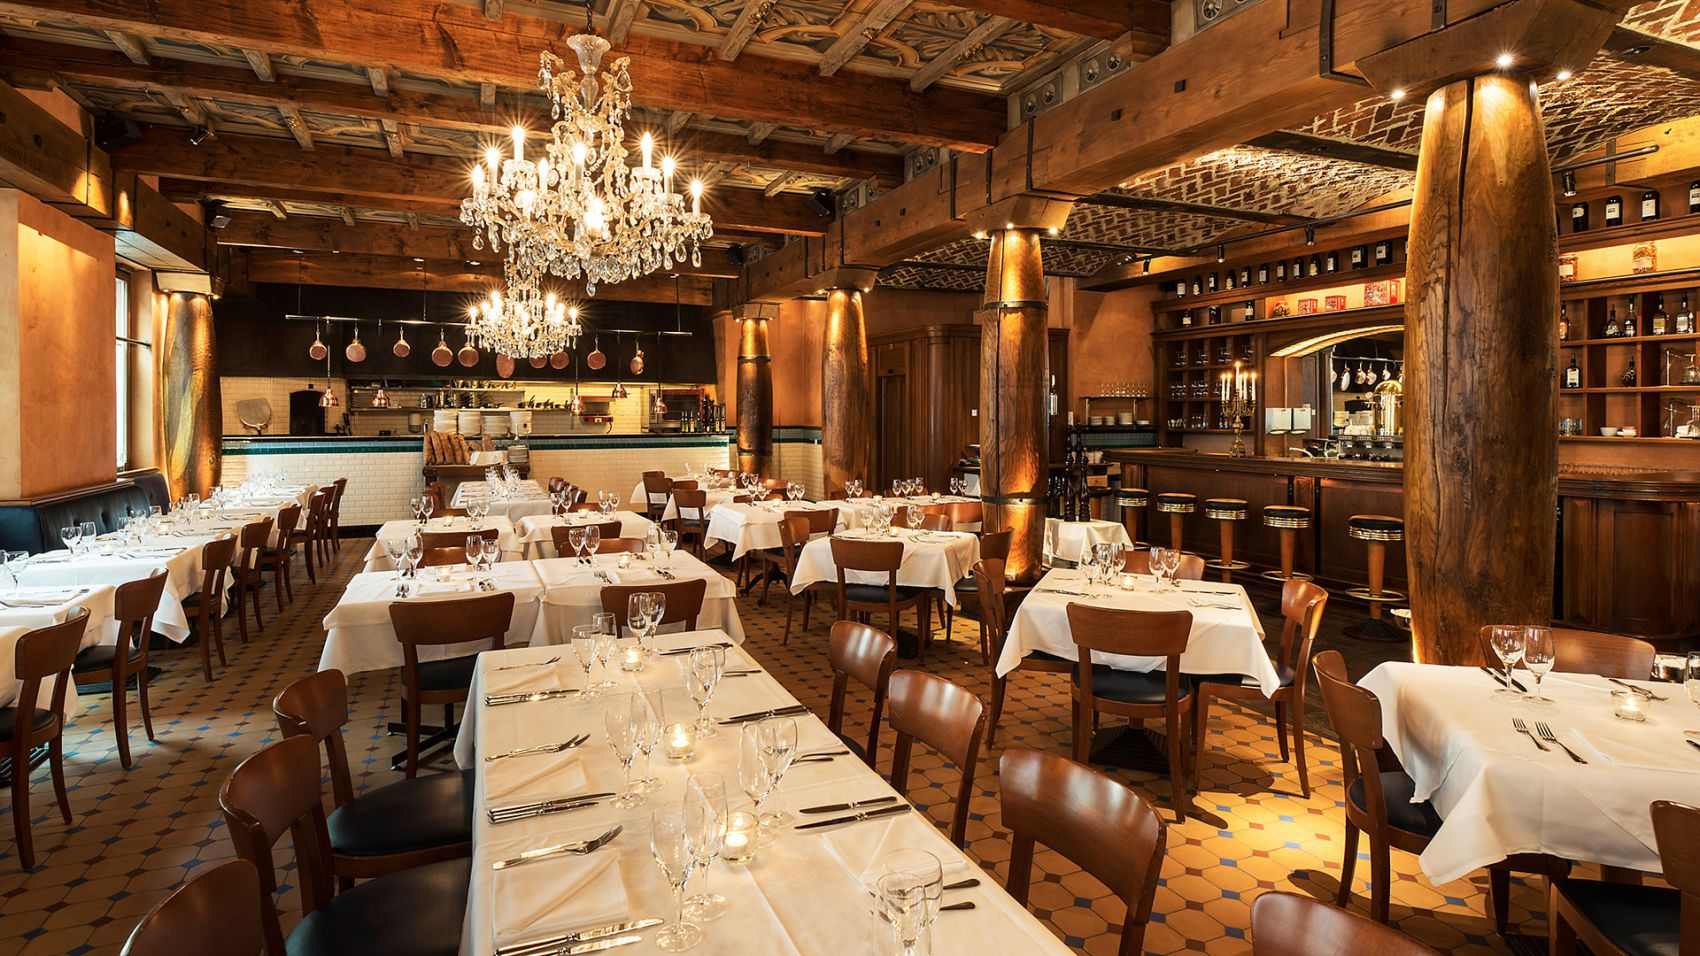 Restaurant la cucina lucerne for Restaurant la cuisine dax